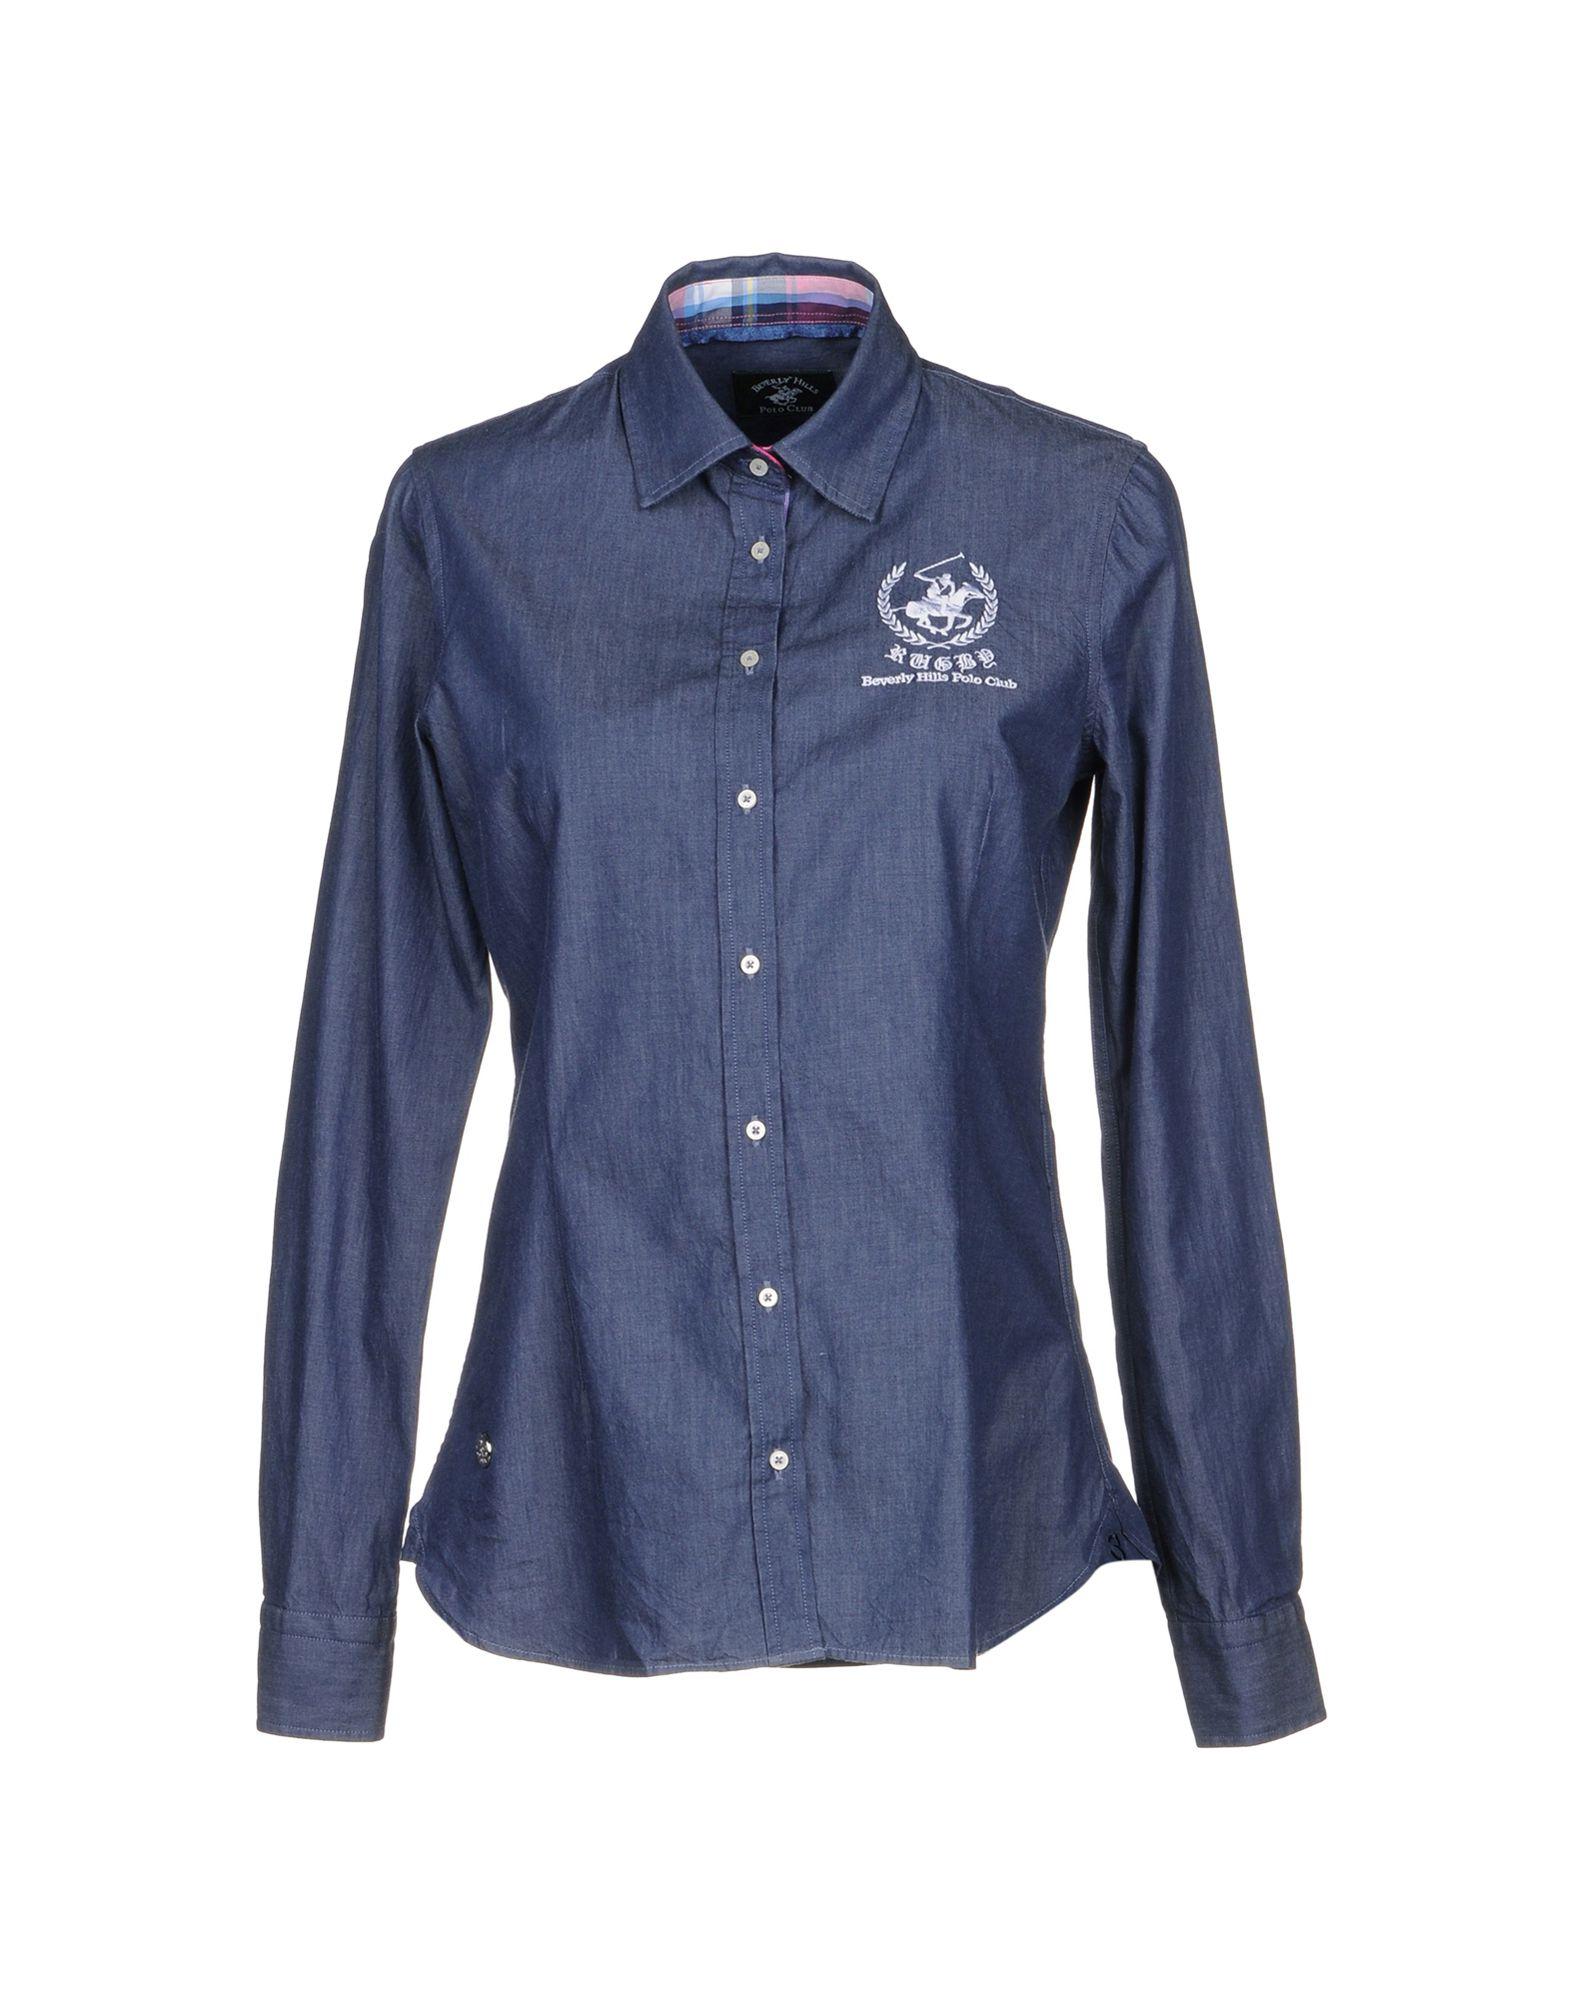 BEVERLY HILLS POLO CLUB Джинсовая рубашка